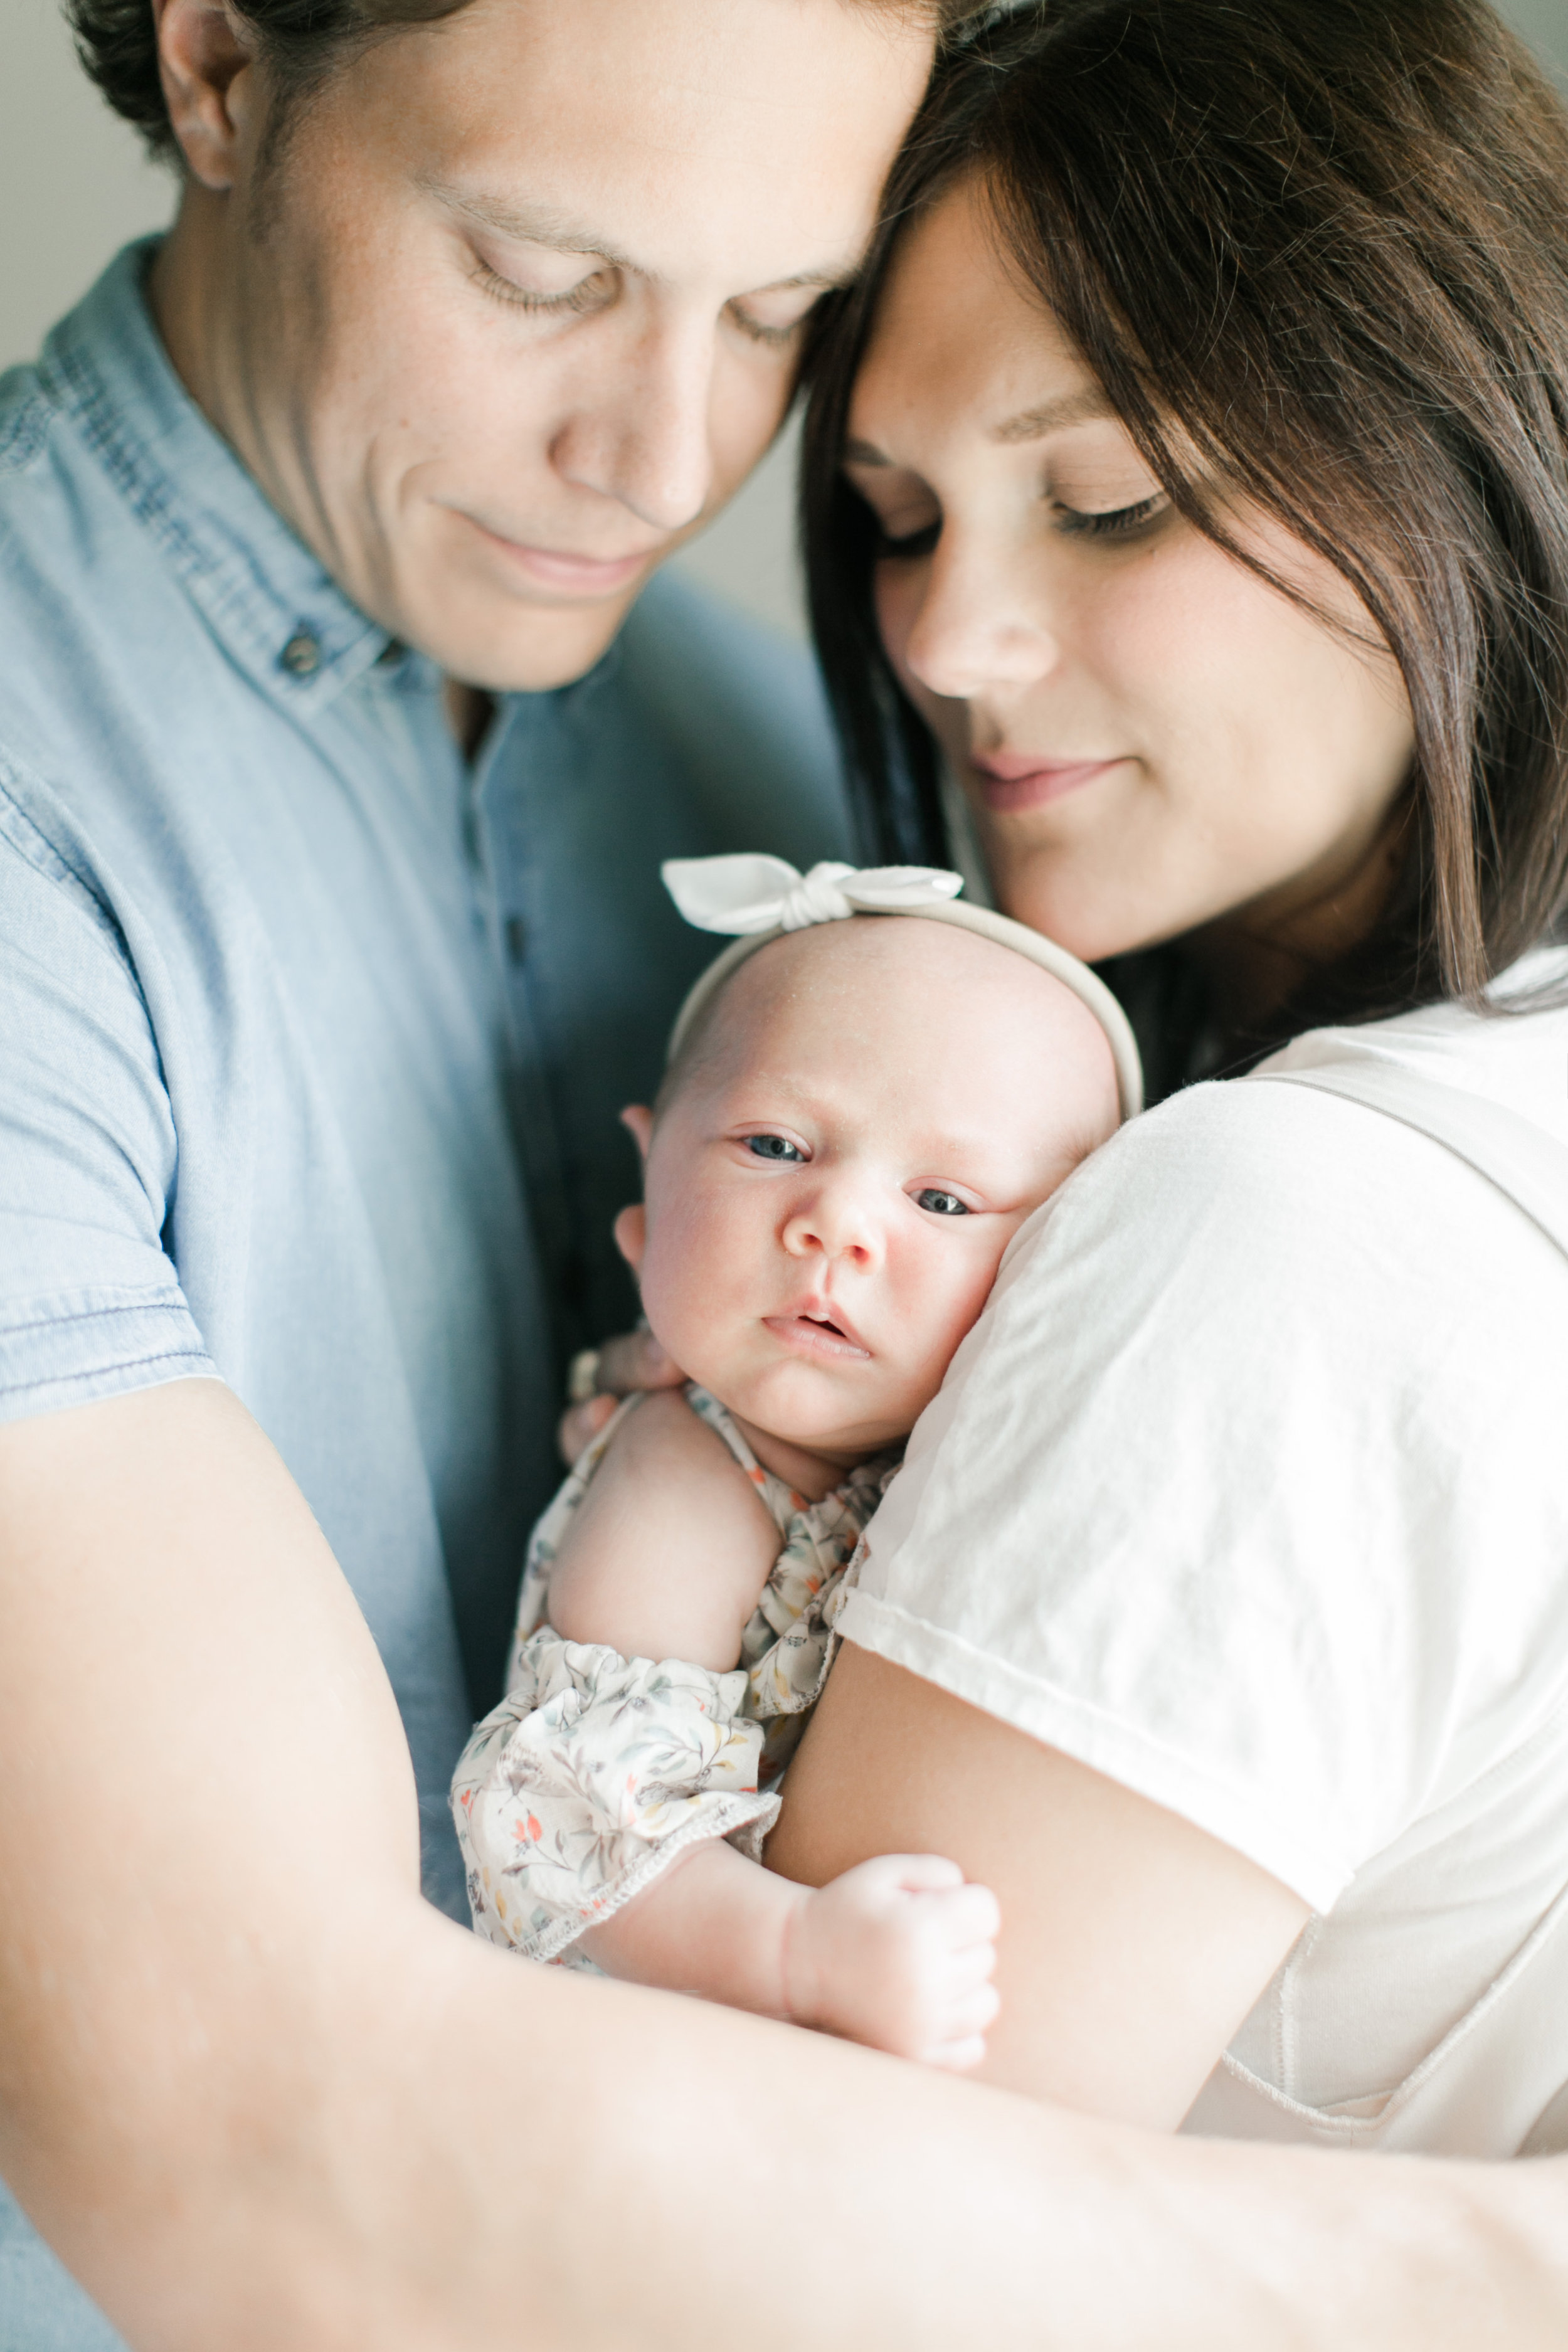 best-toronto-wedding-photographer-london-richelle-hunter-family-film-photography-wiles-1-6-cp[y.jpg